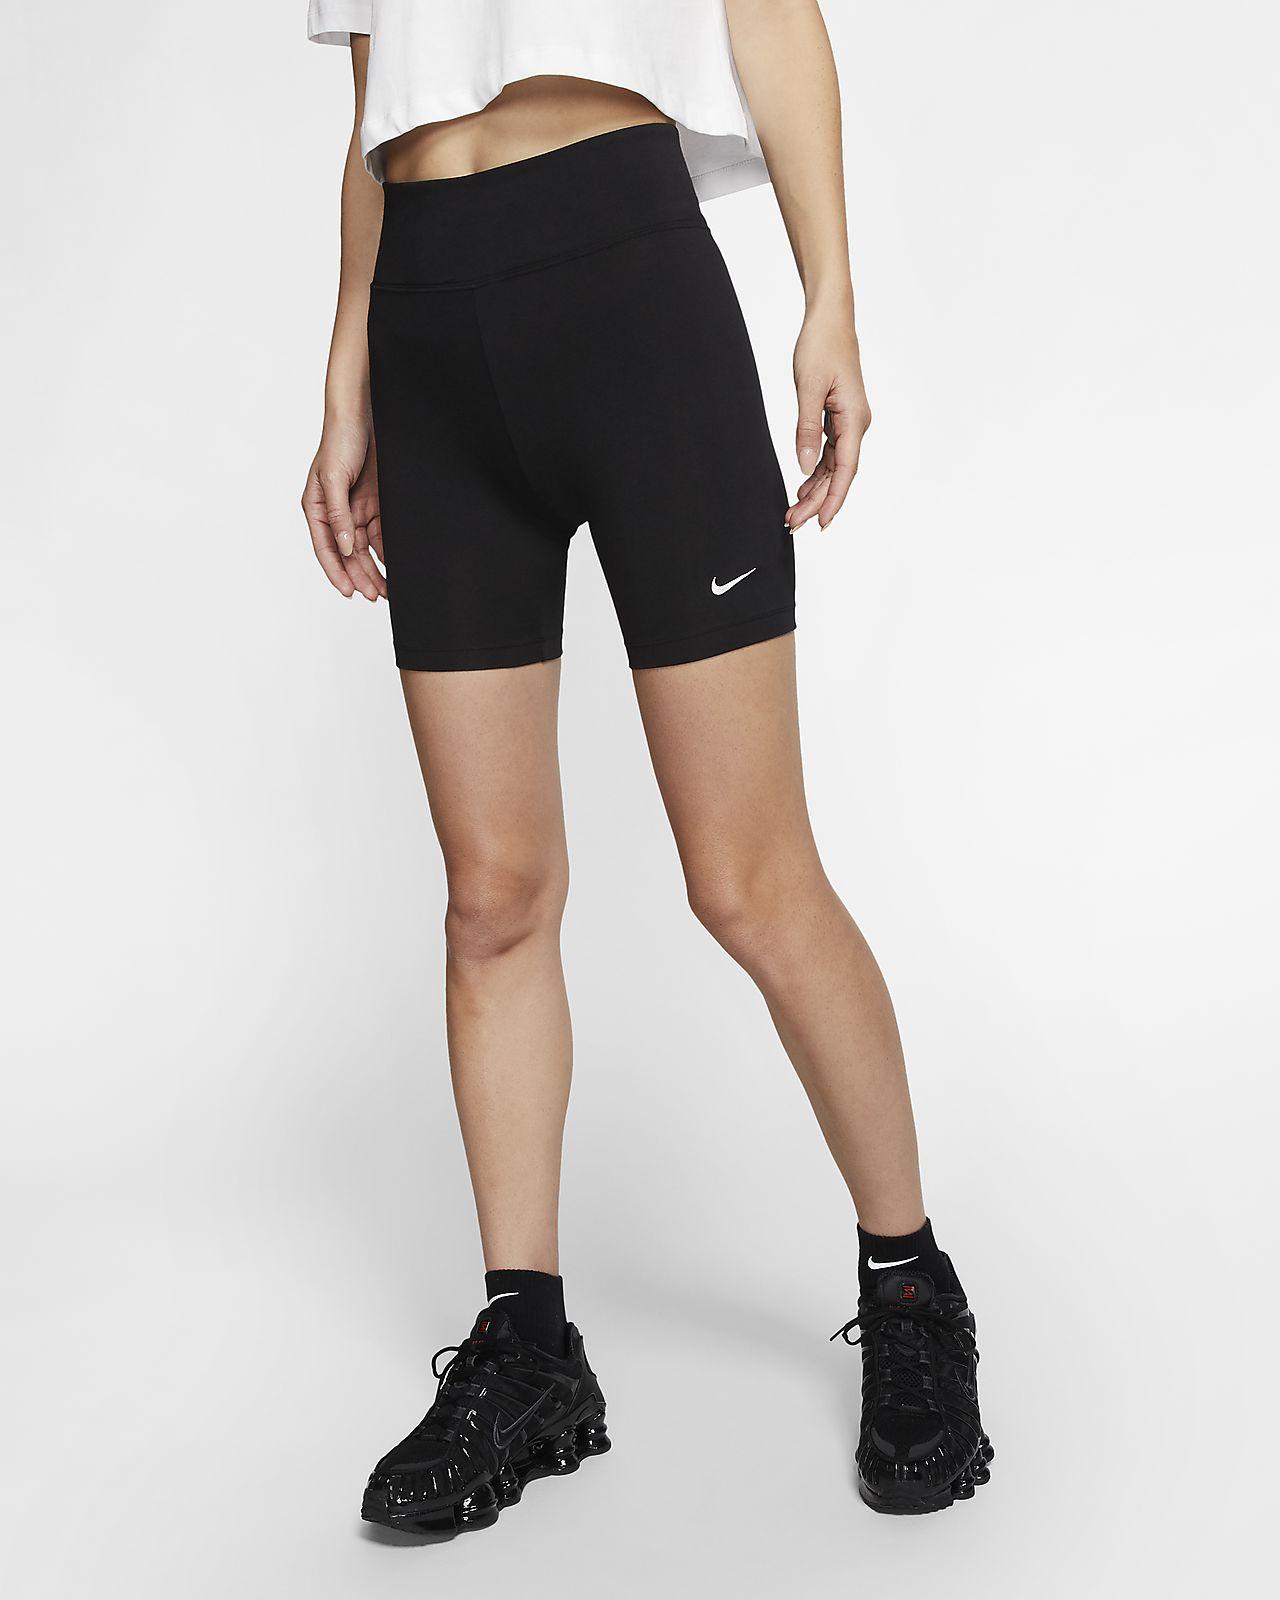 Shorts de ciclismo para mujer Nike Sportswear Leg-A-See